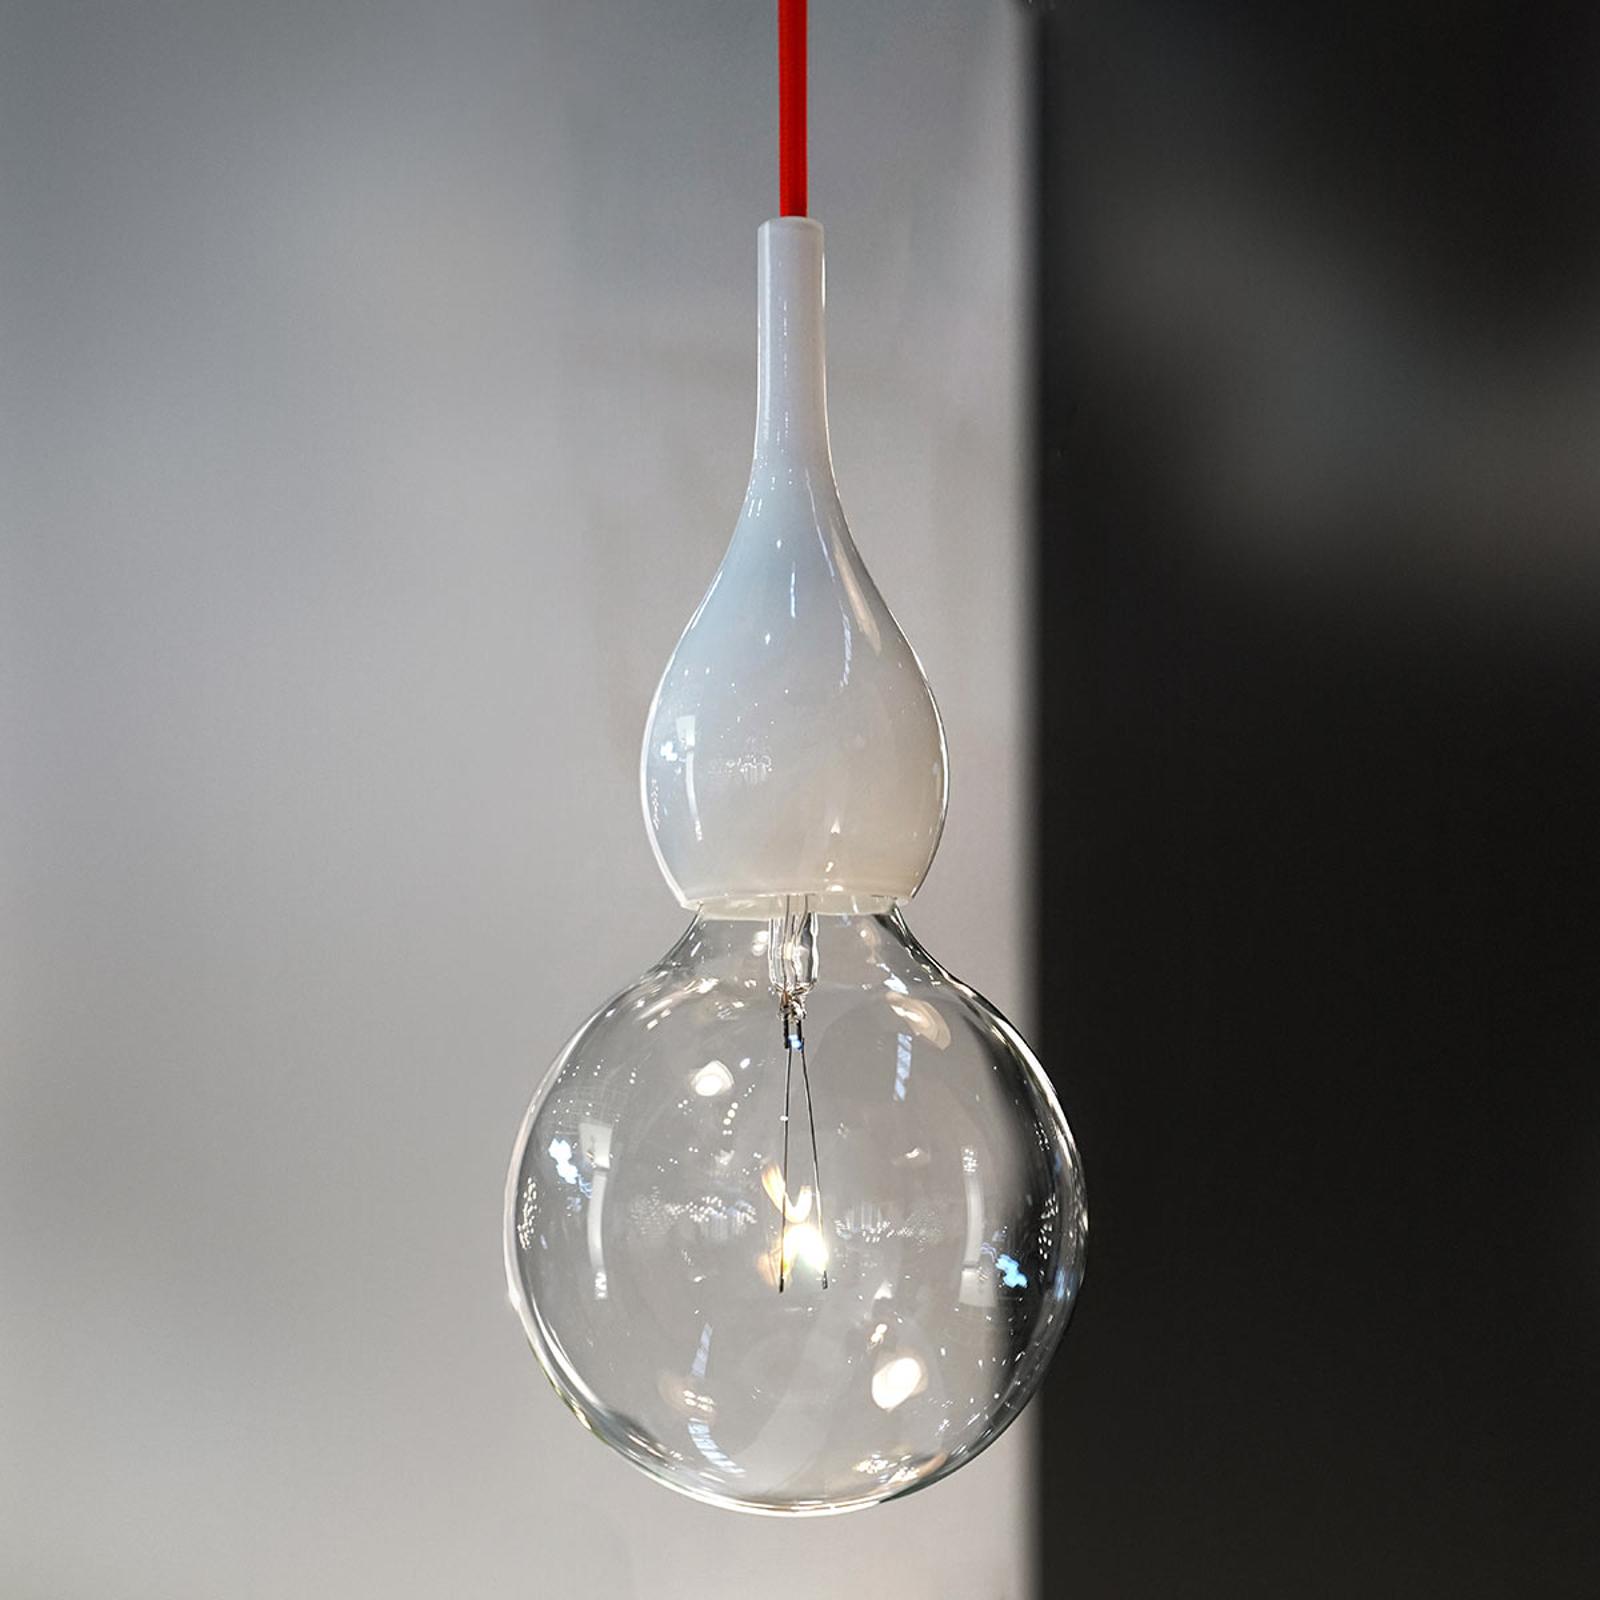 next Blubb mini - Pendelleuchte, opal/Kabel rot